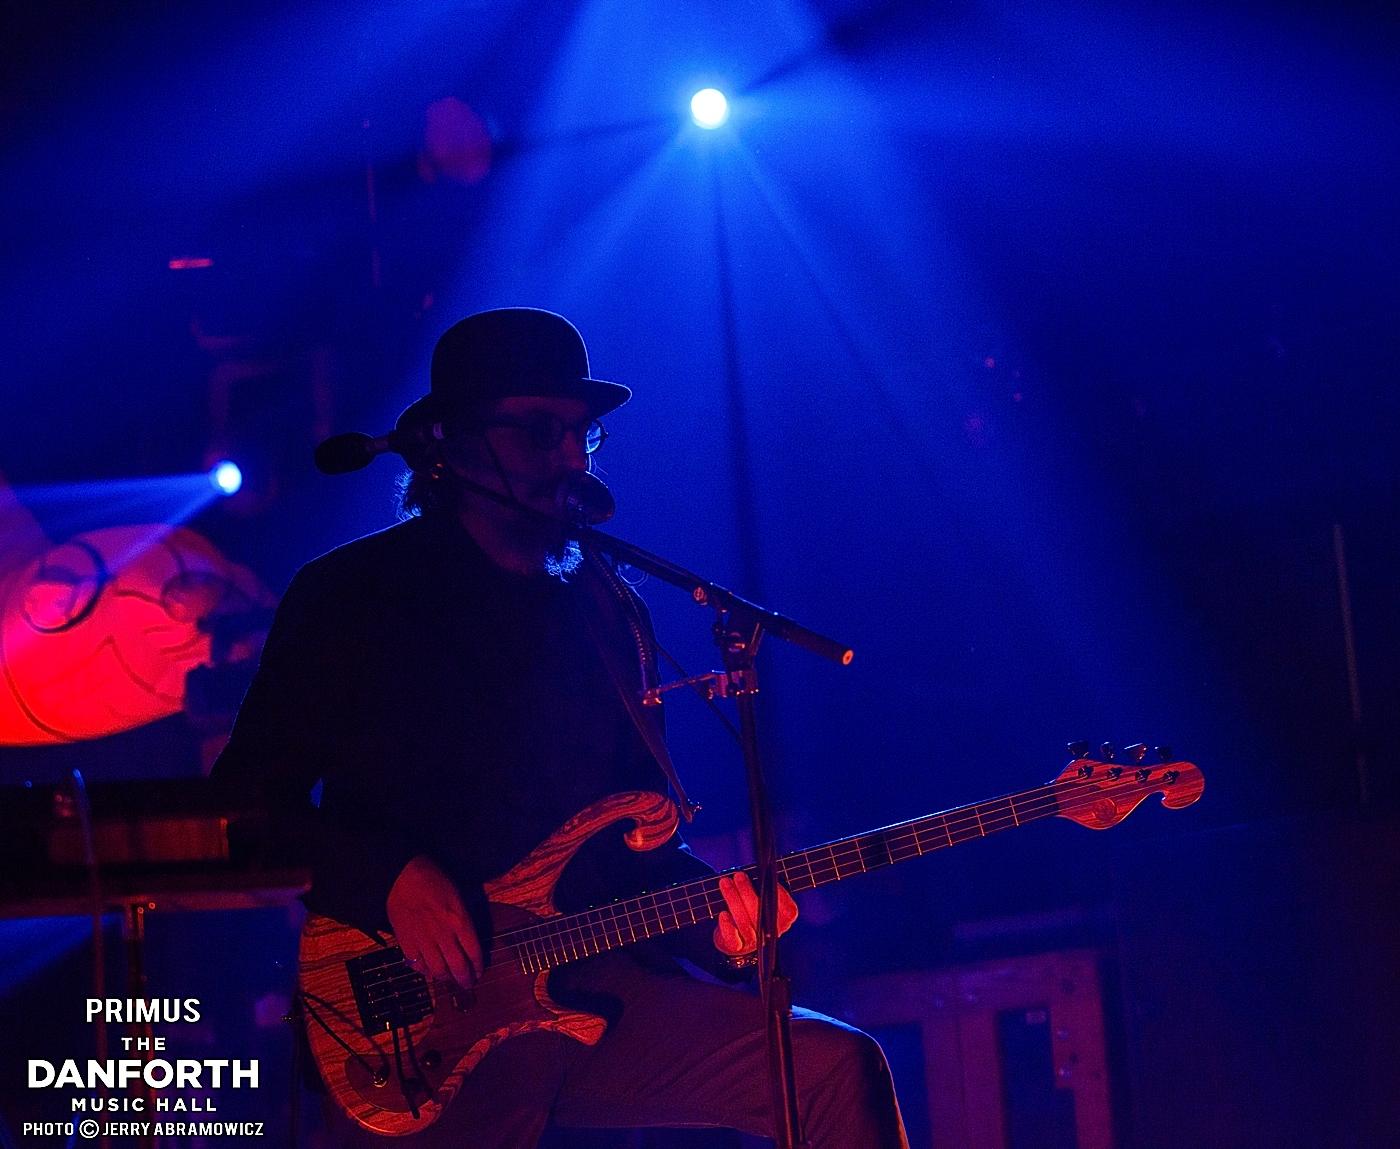 20130608 Primus performs at The Danforth Music Hall Toronto 0461